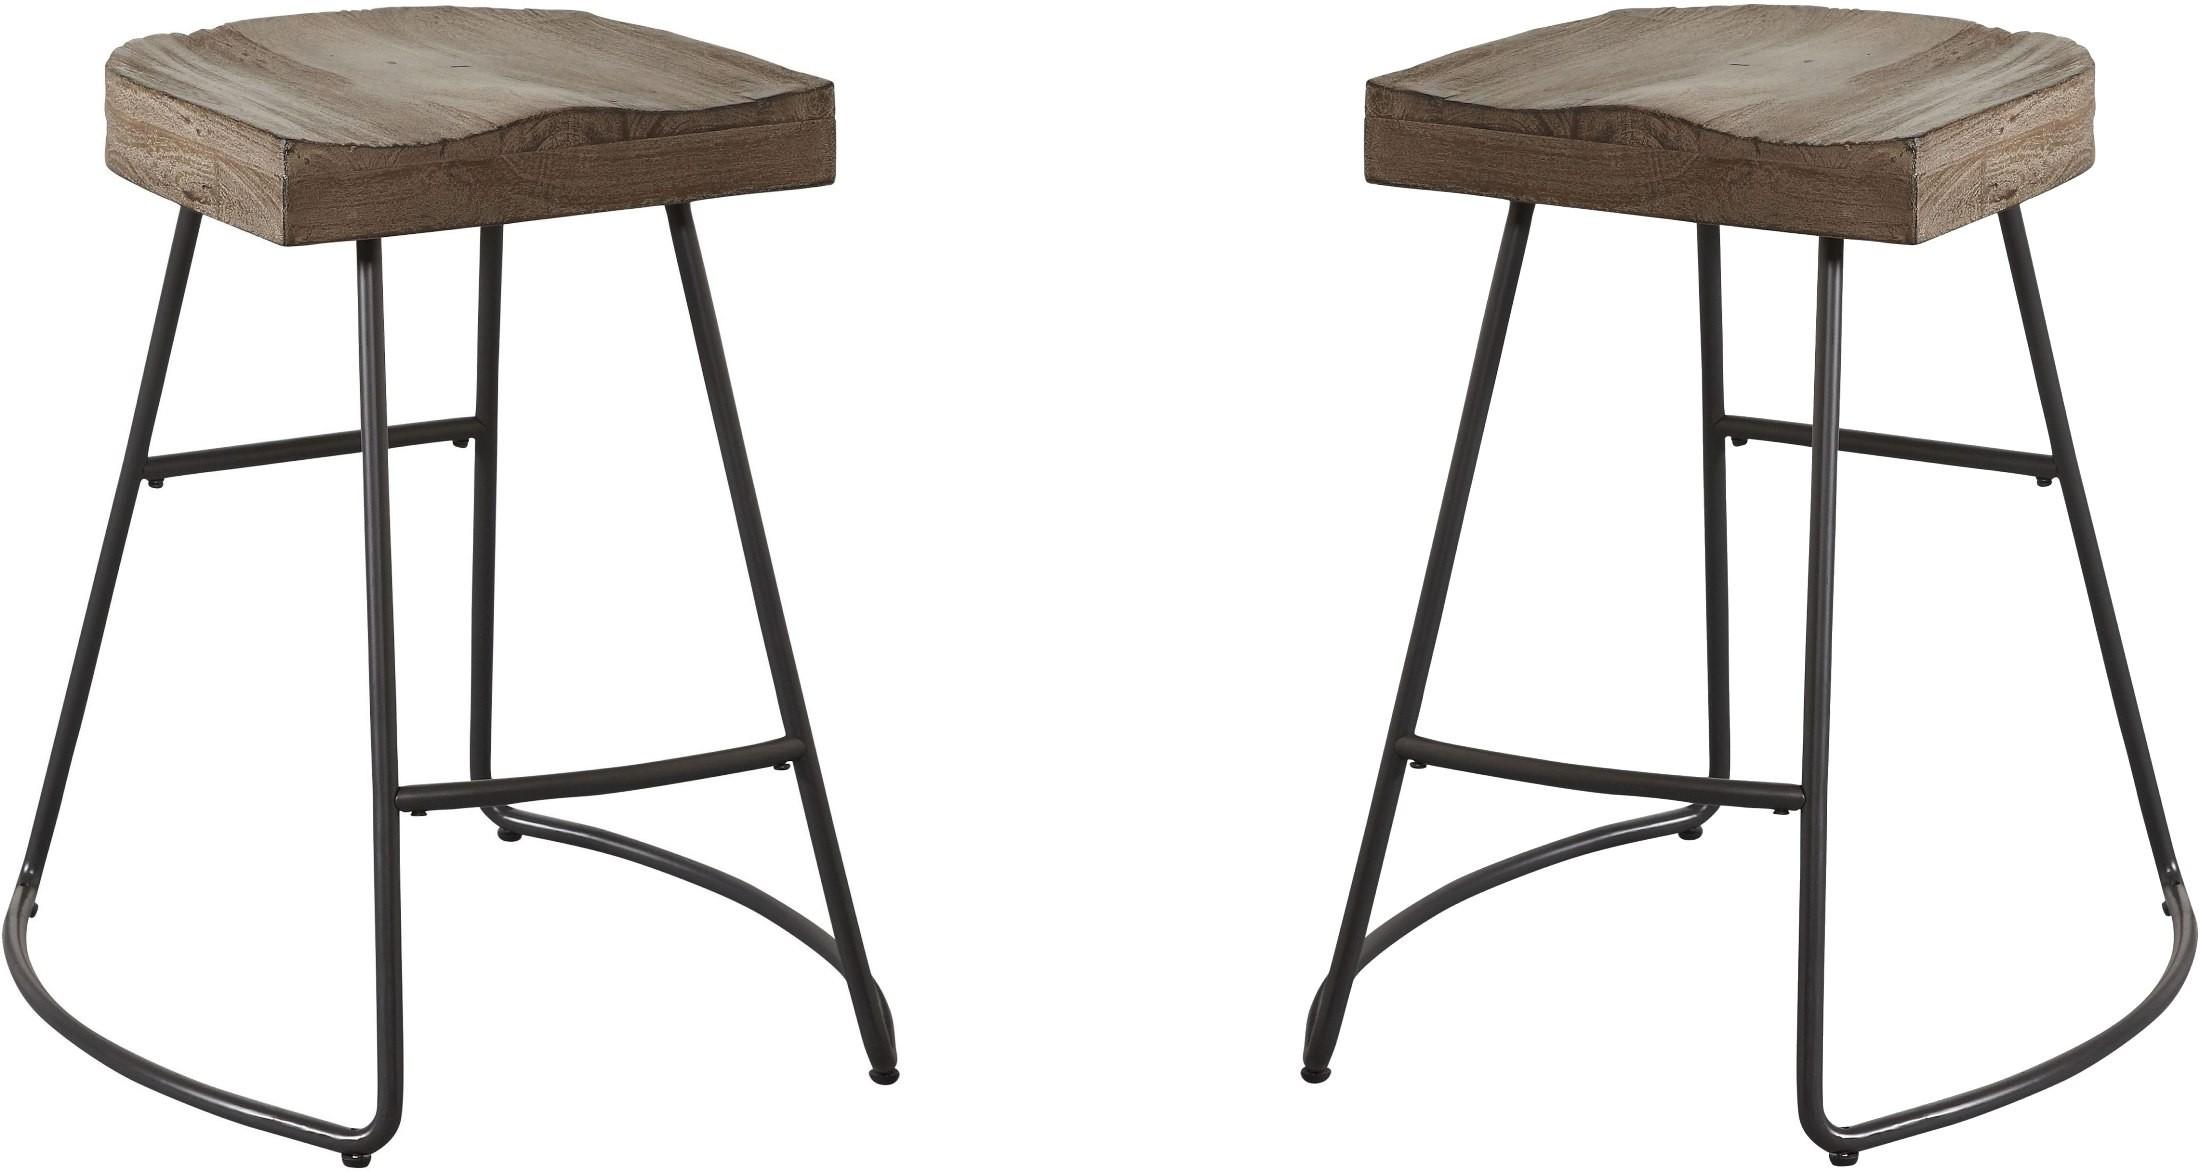 Dark Beach Counter Stool Set Of 2 From Avalon Furniture